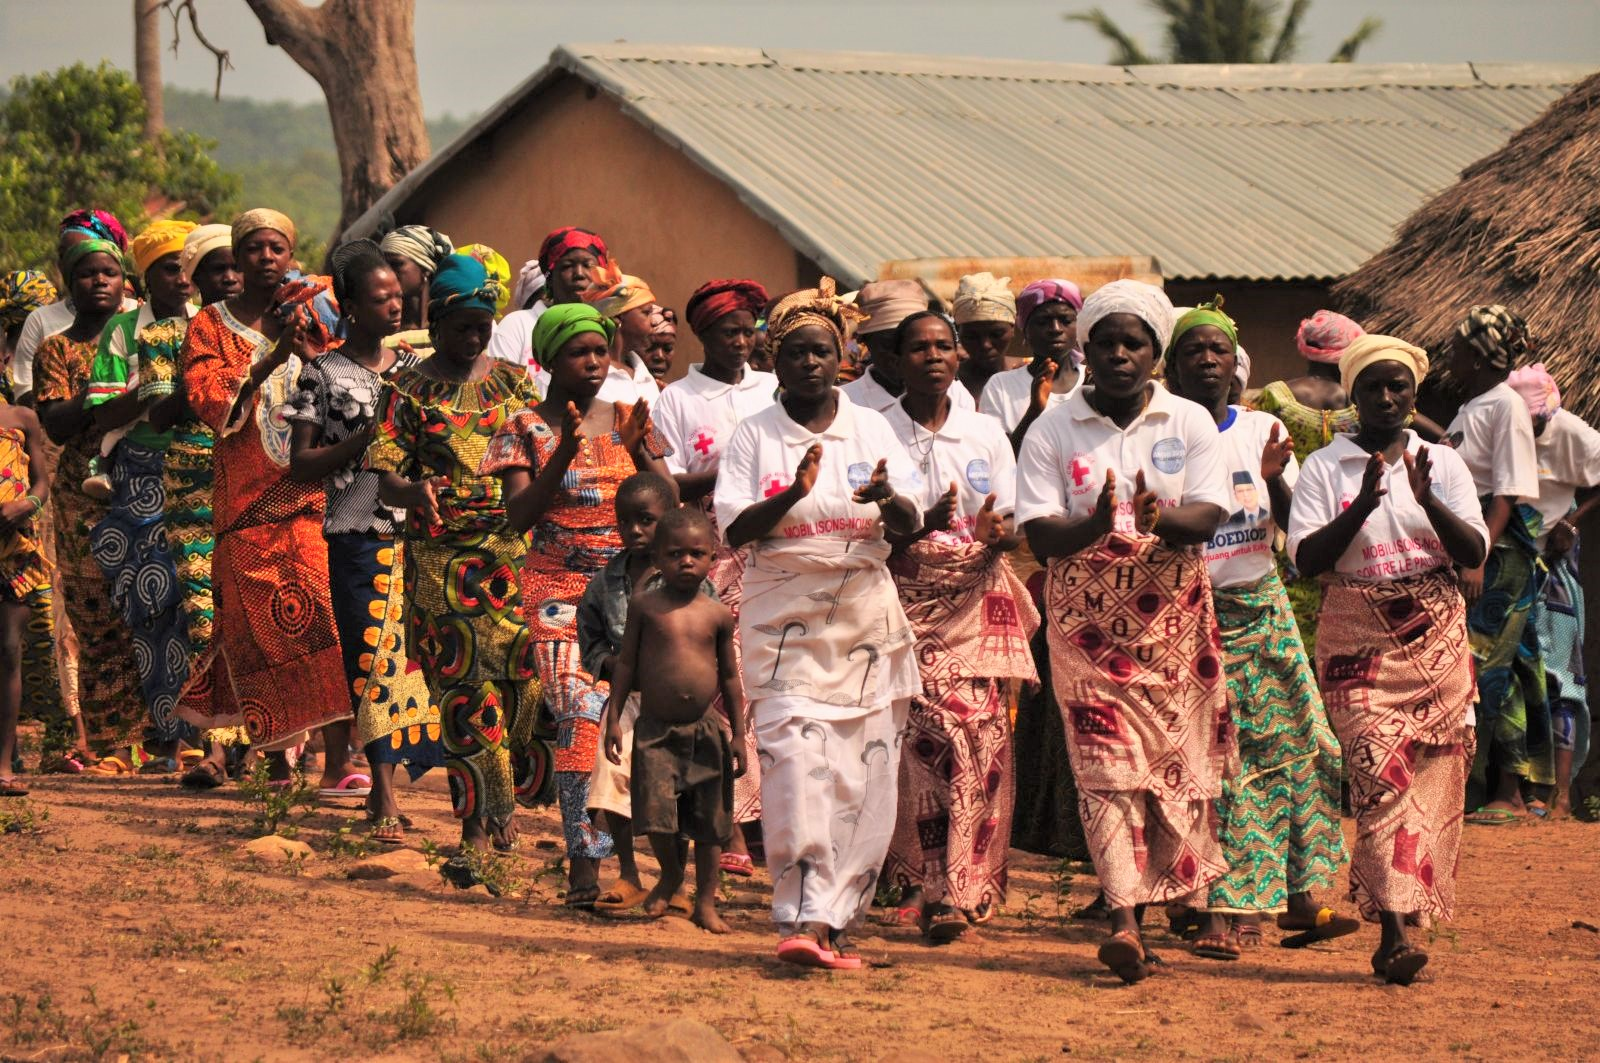 Image via  US Aid Leadership, Management & Governance Project